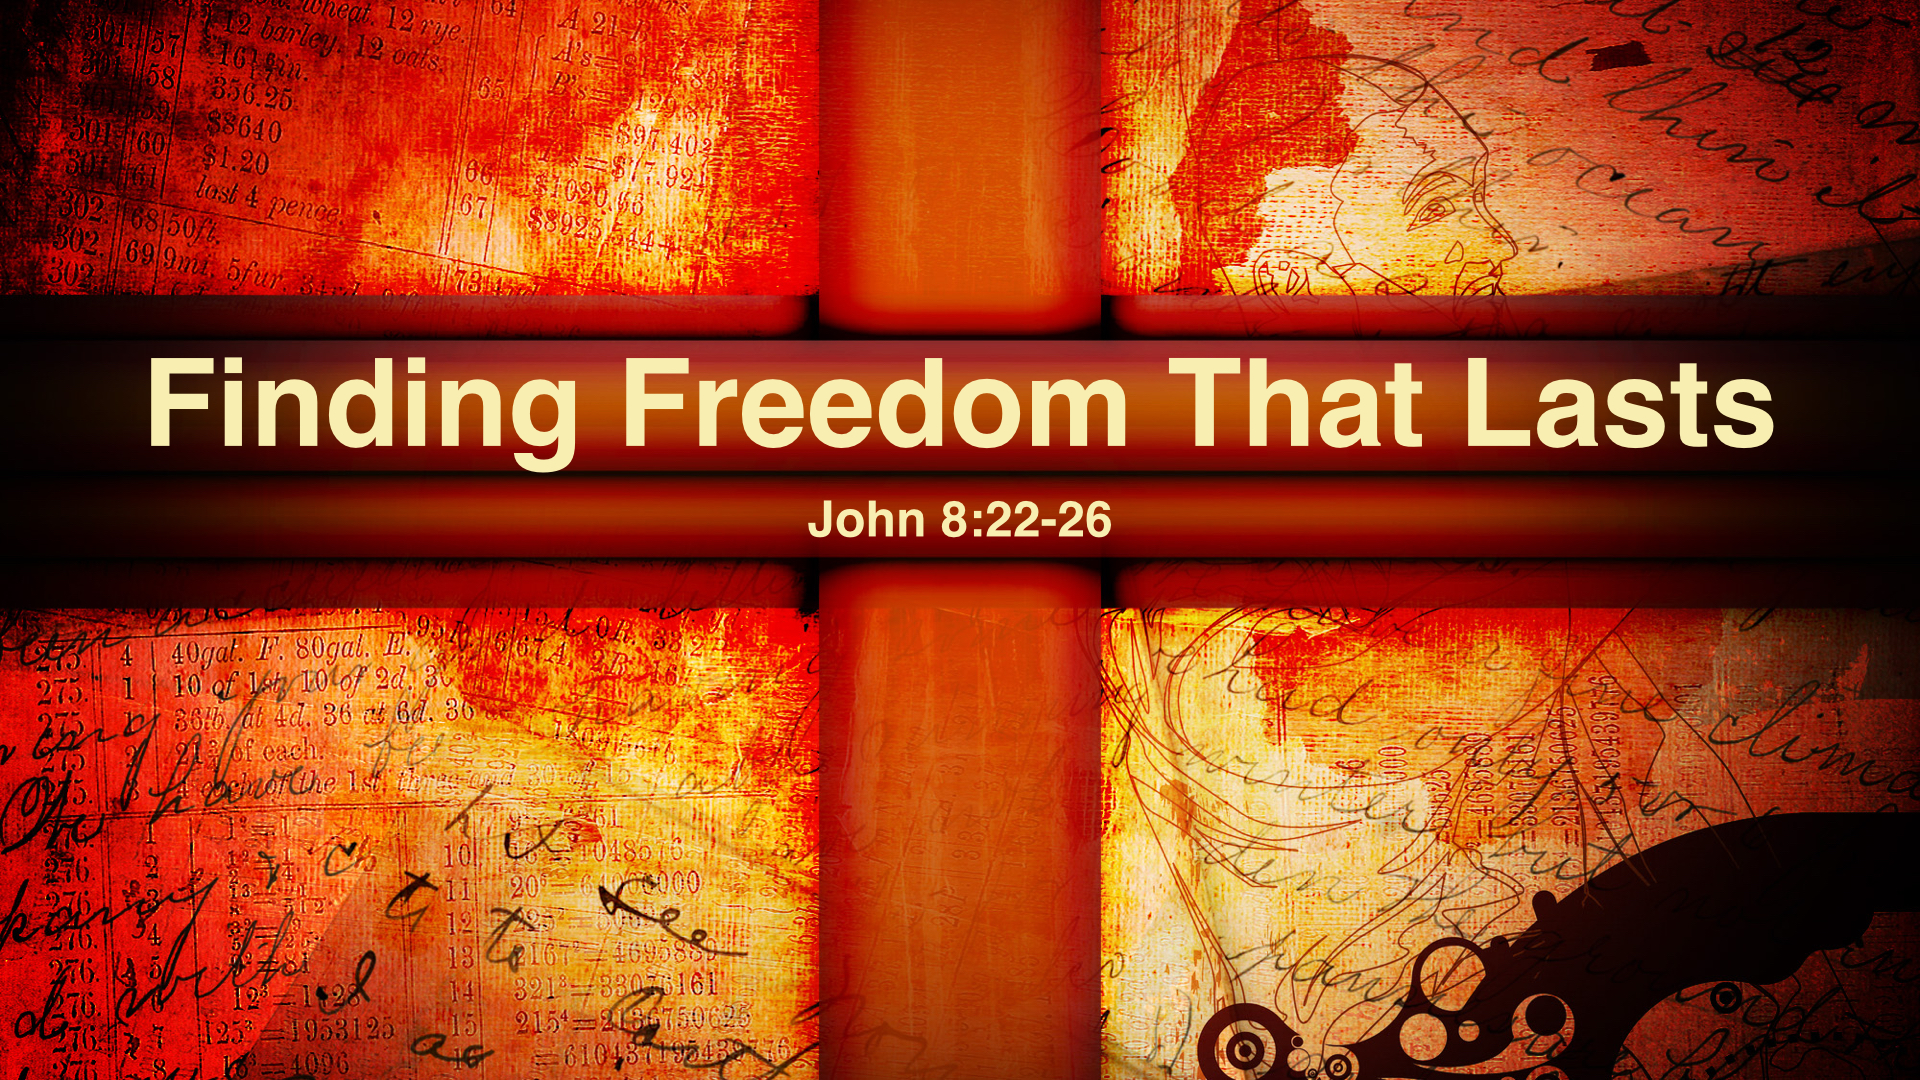 Finding Freedom.jpg.001